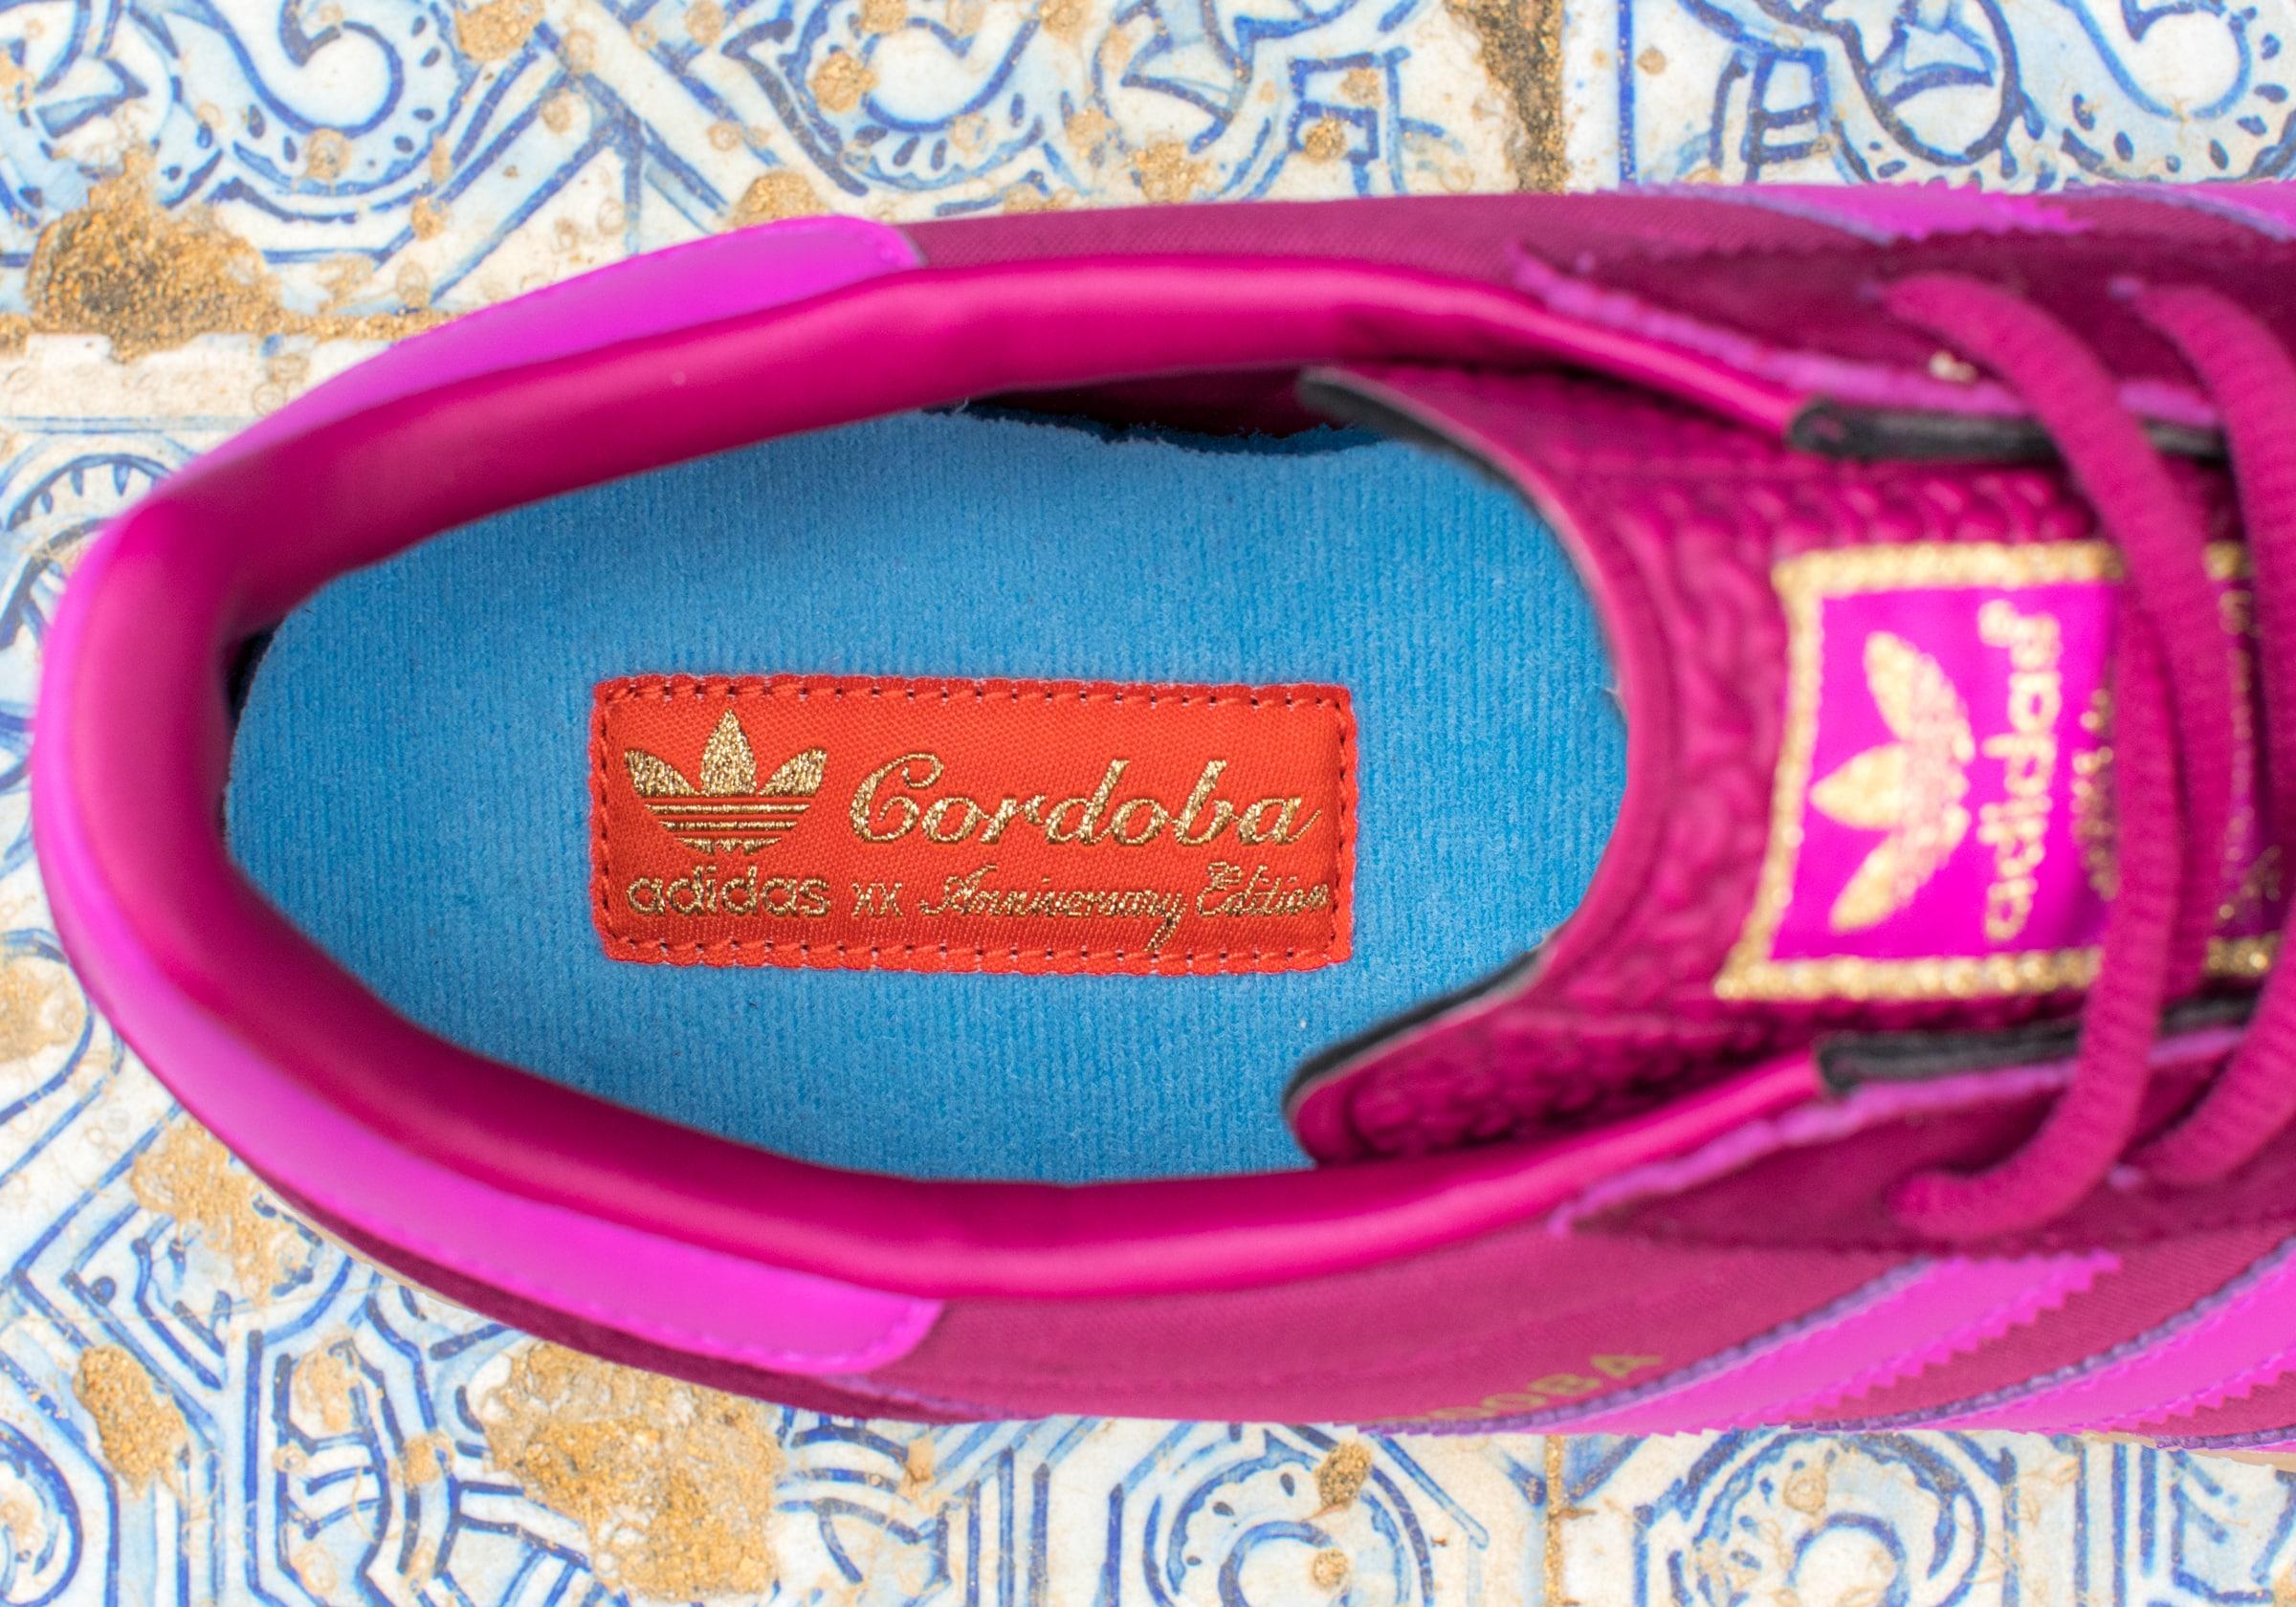 adidas Originals 'Anniversary City Series' Cordoba